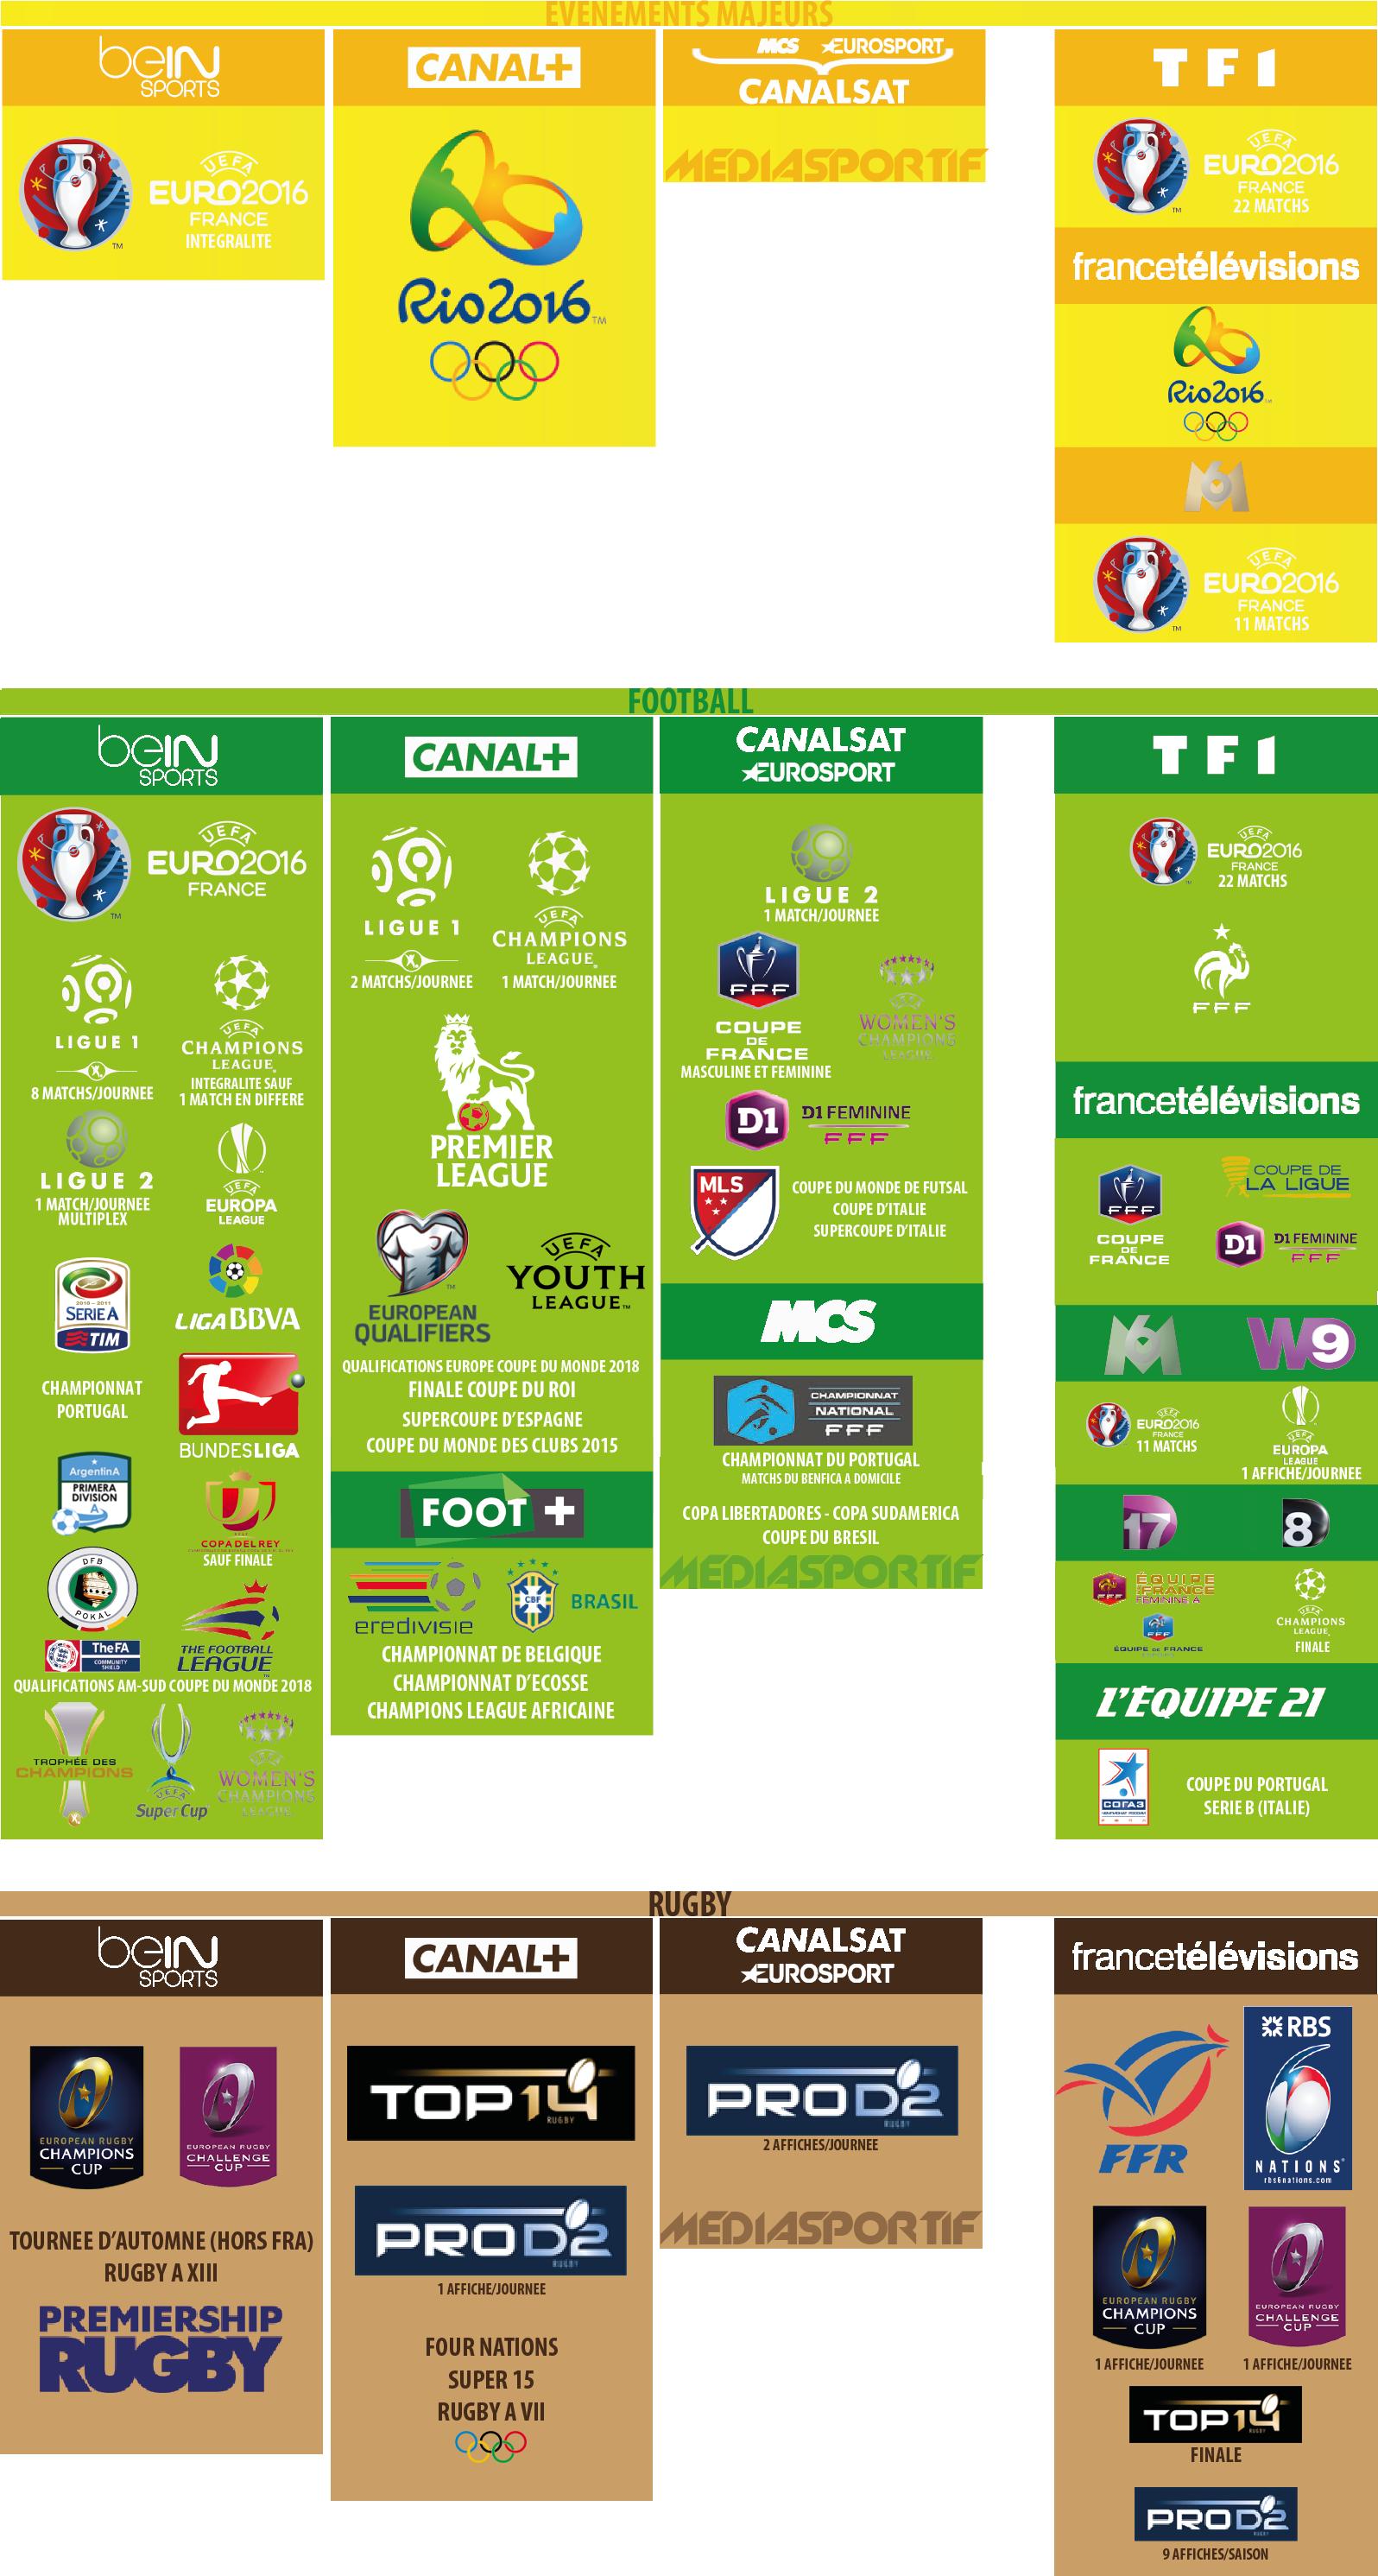 infographie guide droits tv o regarder le sport cette saison mediasportif. Black Bedroom Furniture Sets. Home Design Ideas